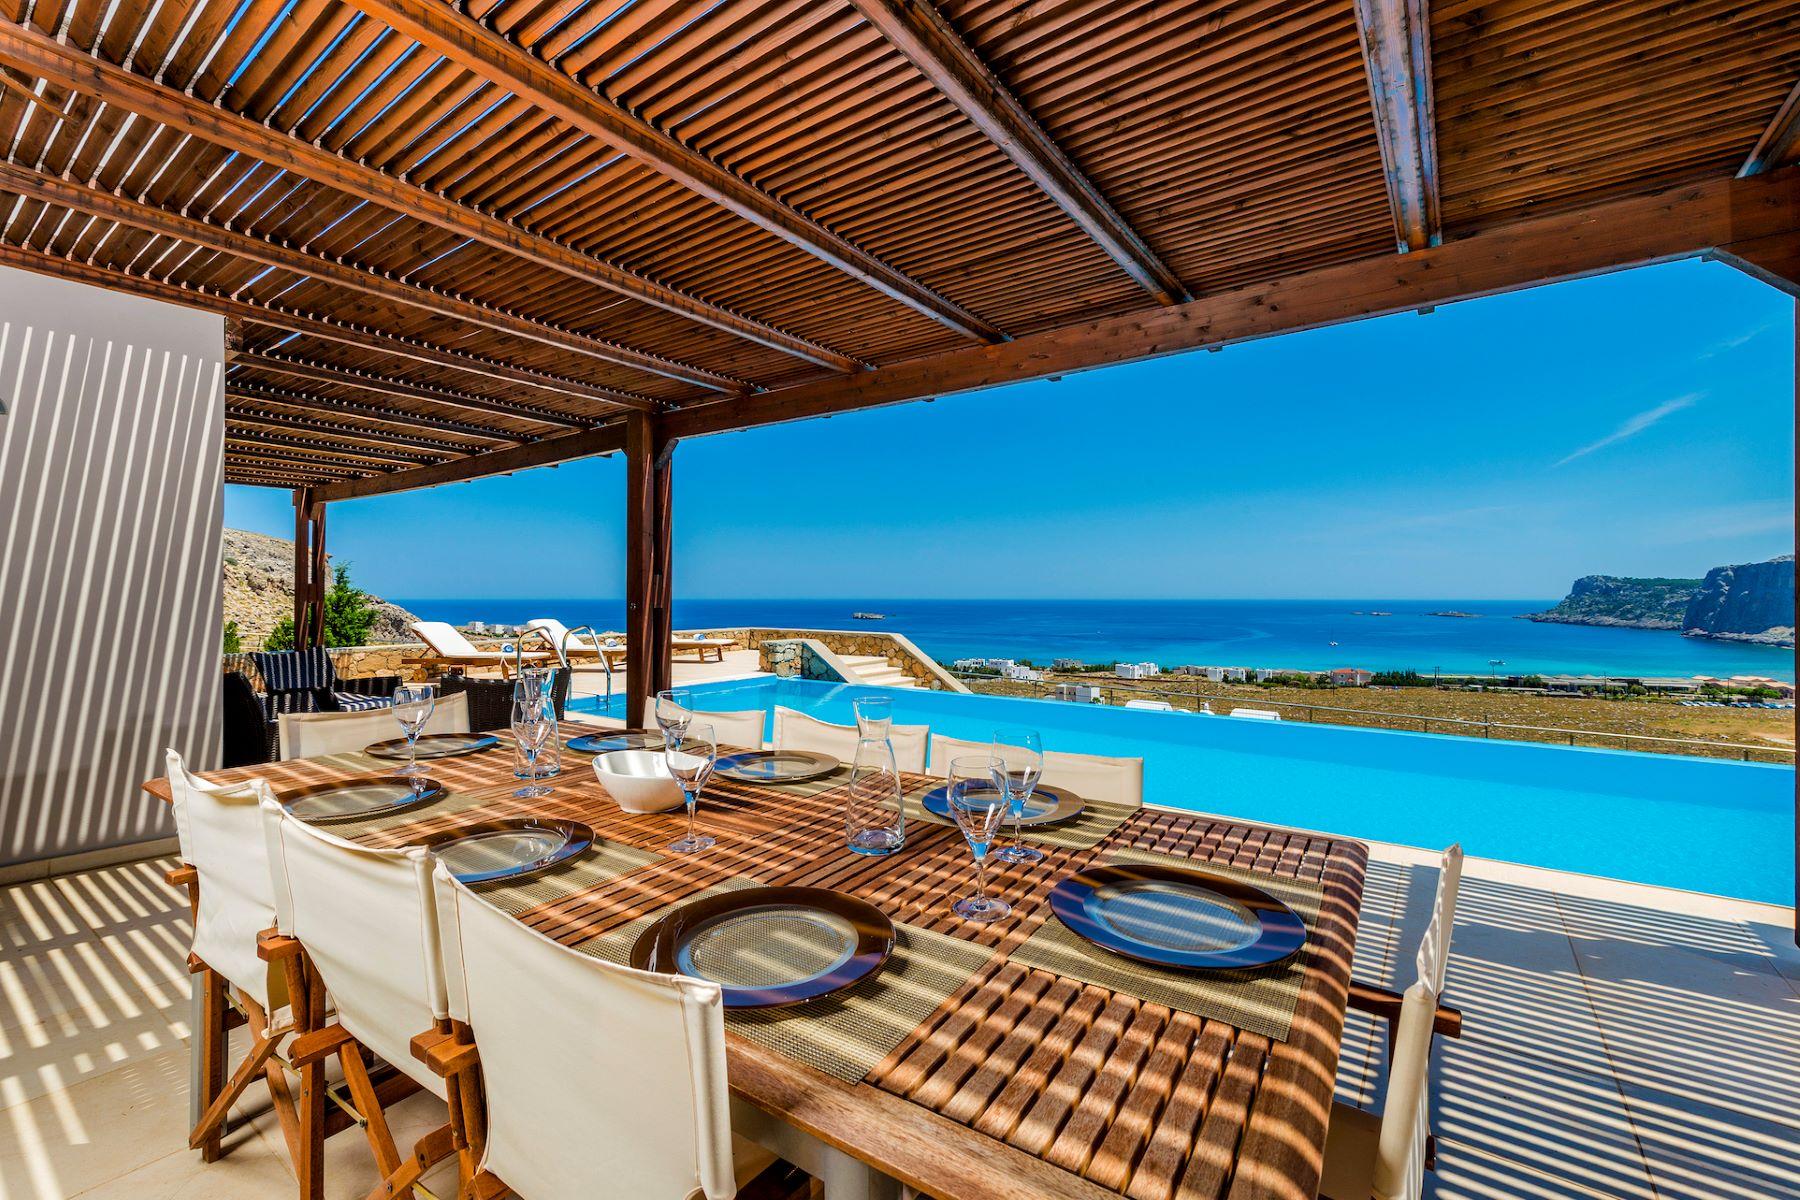 Single Family Home for Sale at Jet Set Navarone Bay Jet-Set Rhodes, Southern Aegean, 85133 Greece